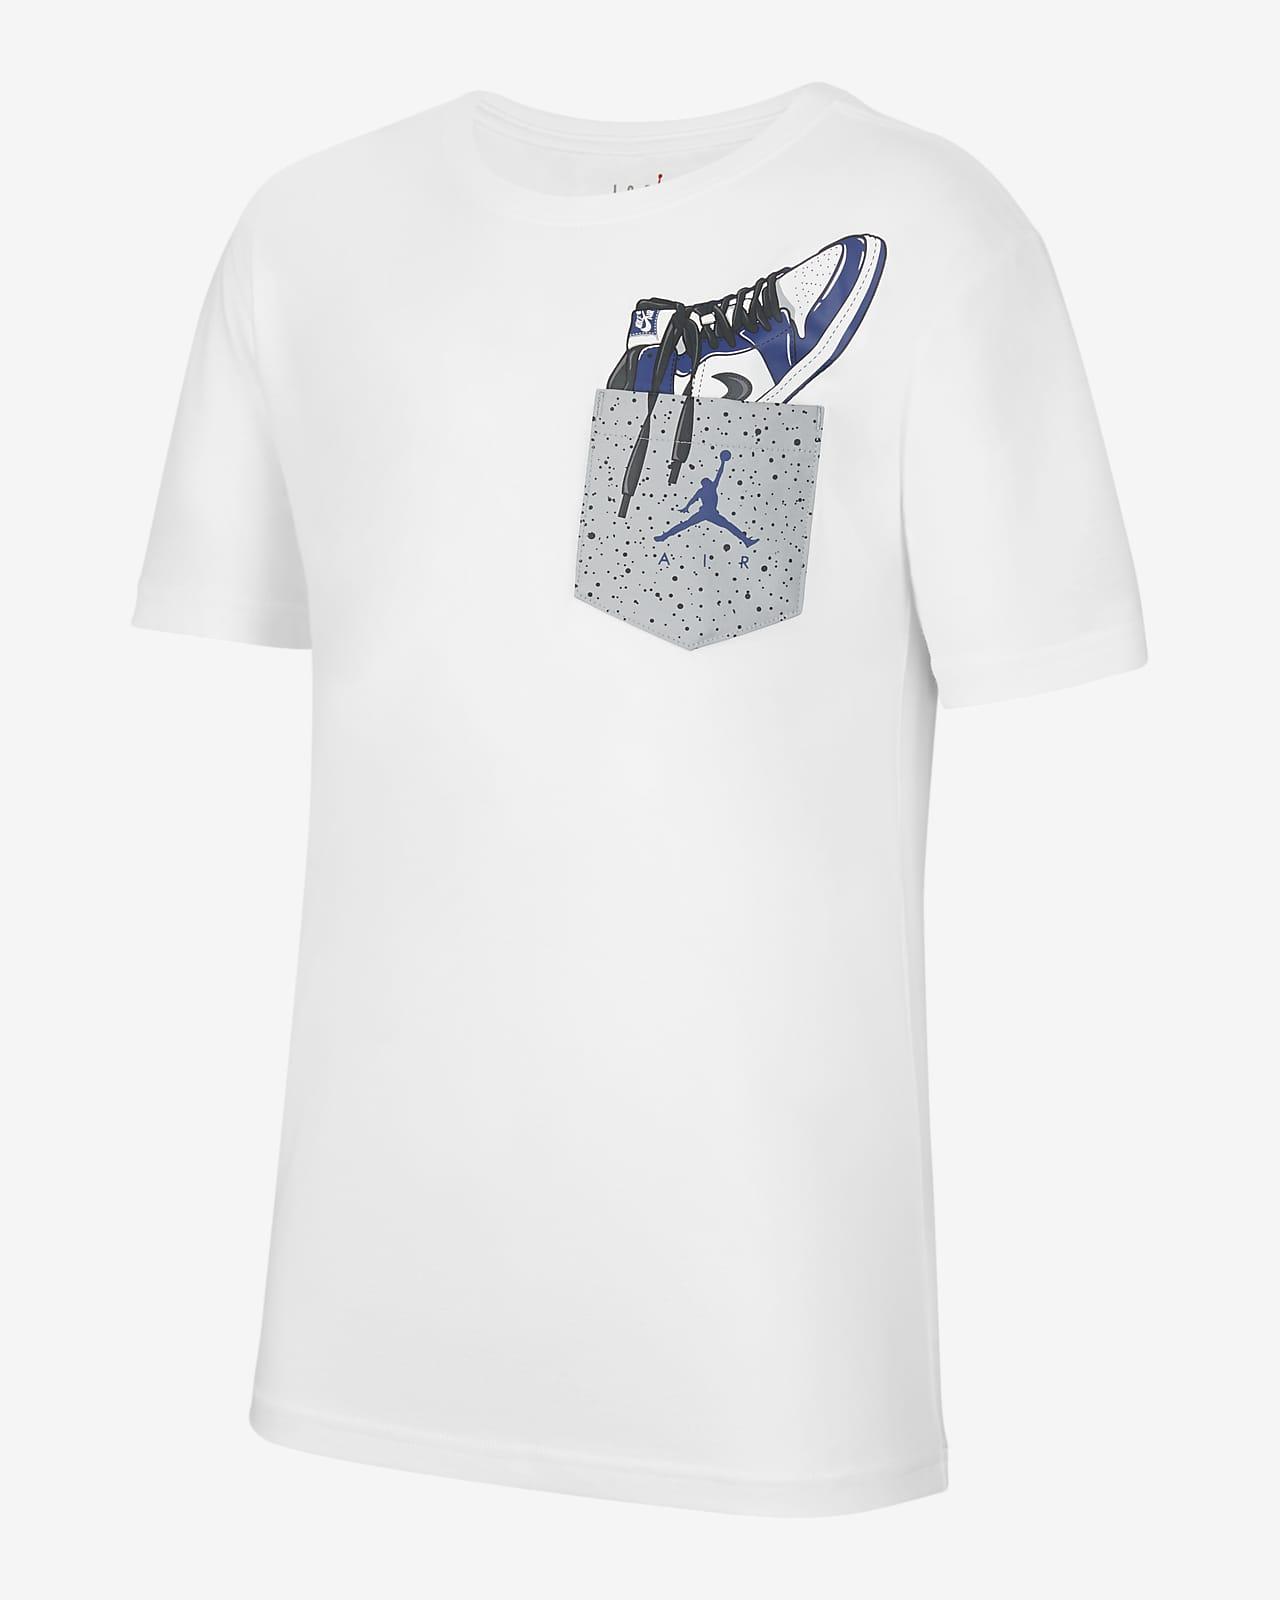 Jordan Big Kids' (Boys') T-Shirt. Nike.com